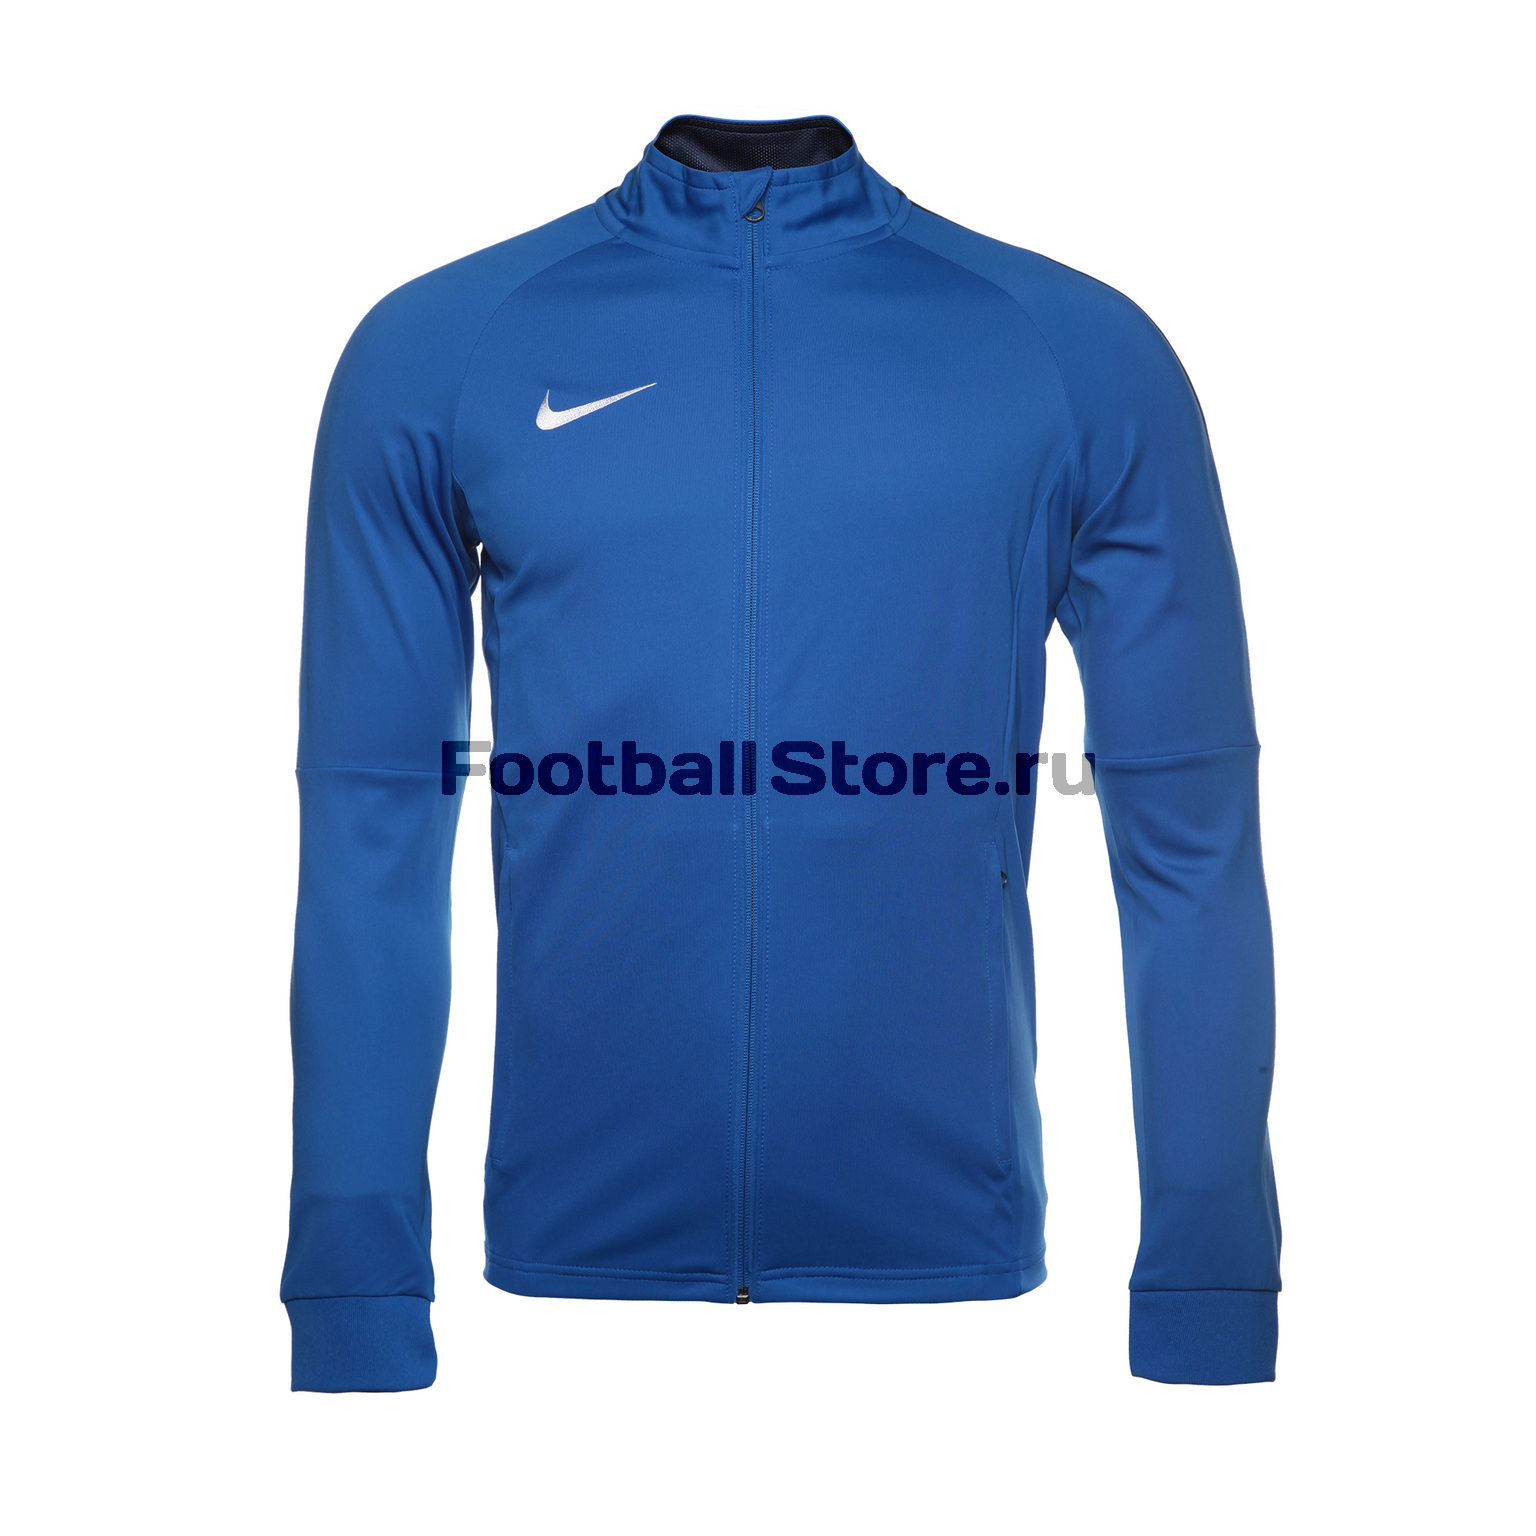 Олимпийка Nike Dry Academy18 893701-463